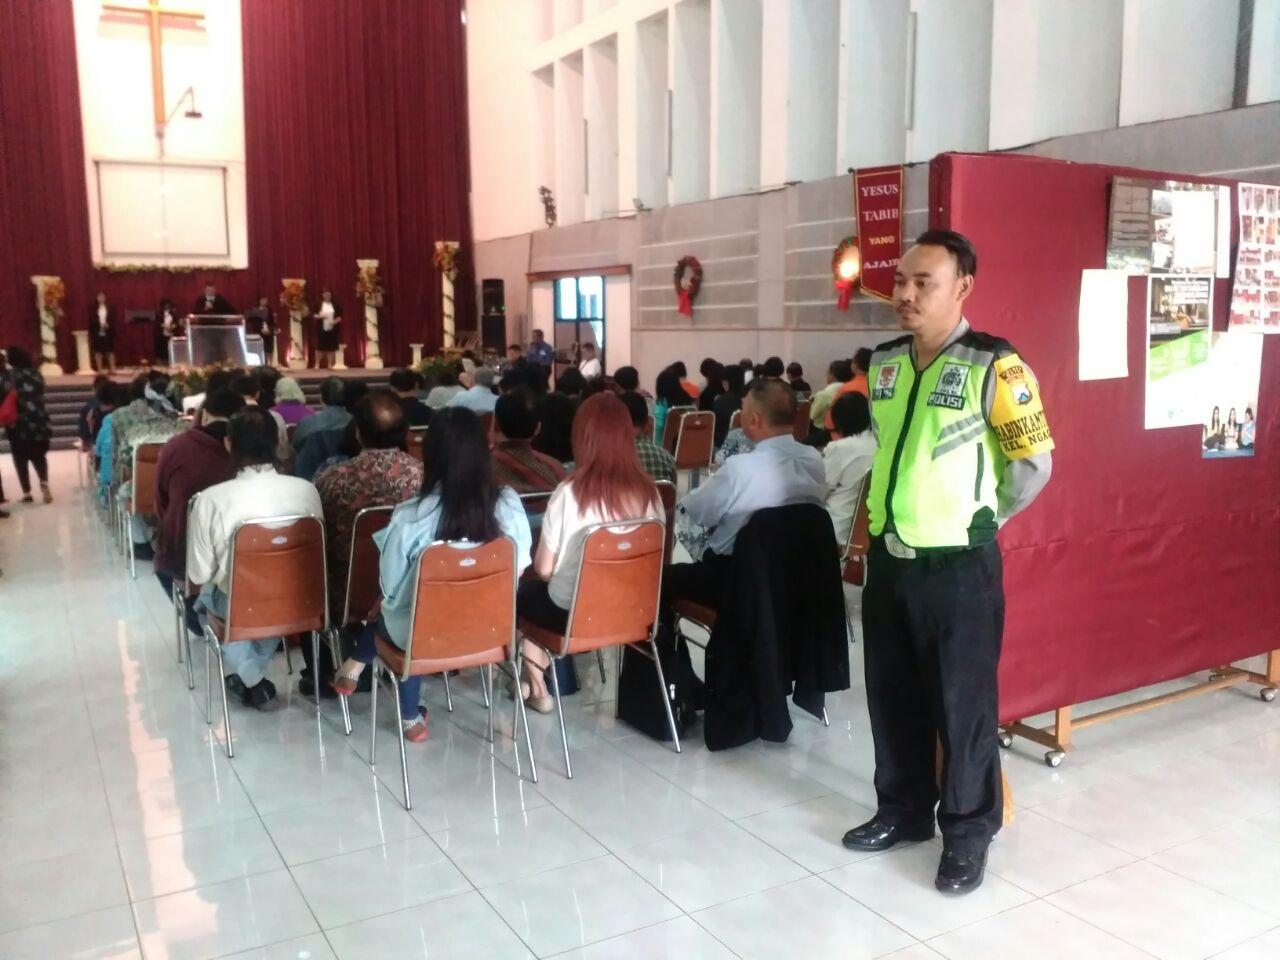 Anggota Bhabin Polsek Batu Kota Polres Batu Bantu Melakukan Giat Pengamanan Ibadah Di Gereja Guna Berikan Rasa Aman Saan Beribadah